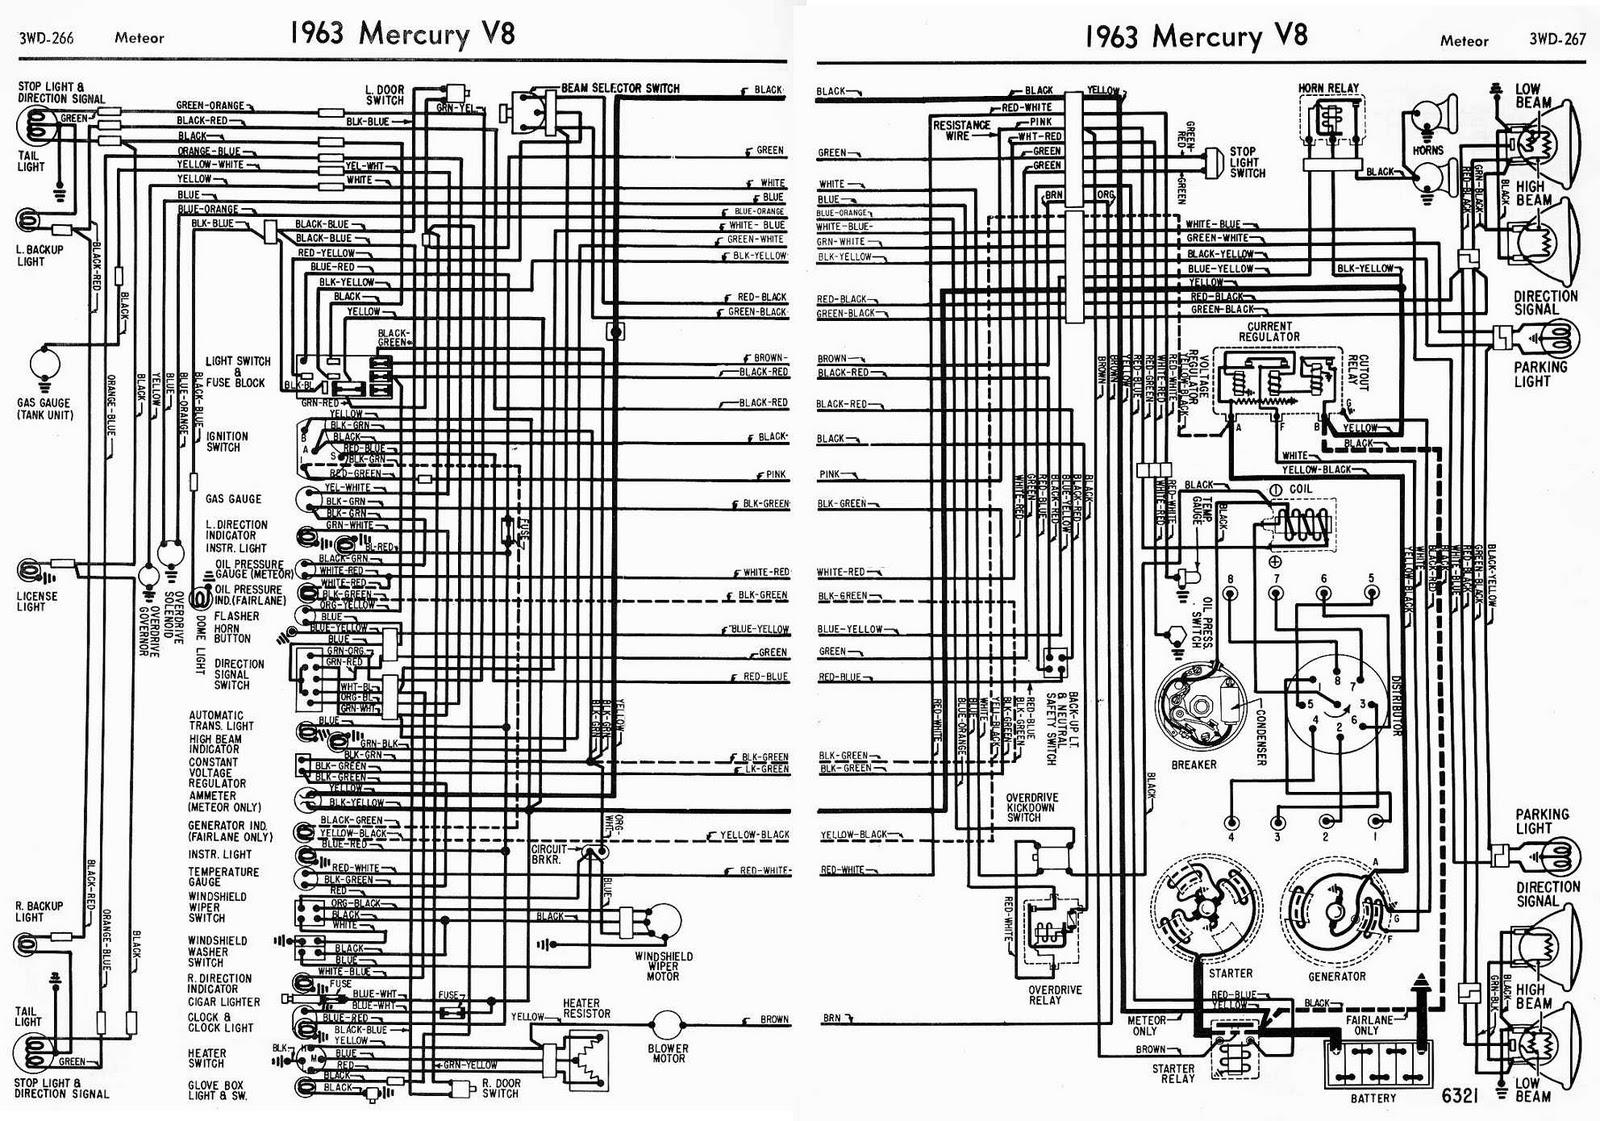 MB_3727] 63 Plymouth Wiring Diagram Download DiagramTomy Opein Menia Nedly Benkeme Mohammedshrine Librar Wiring 101